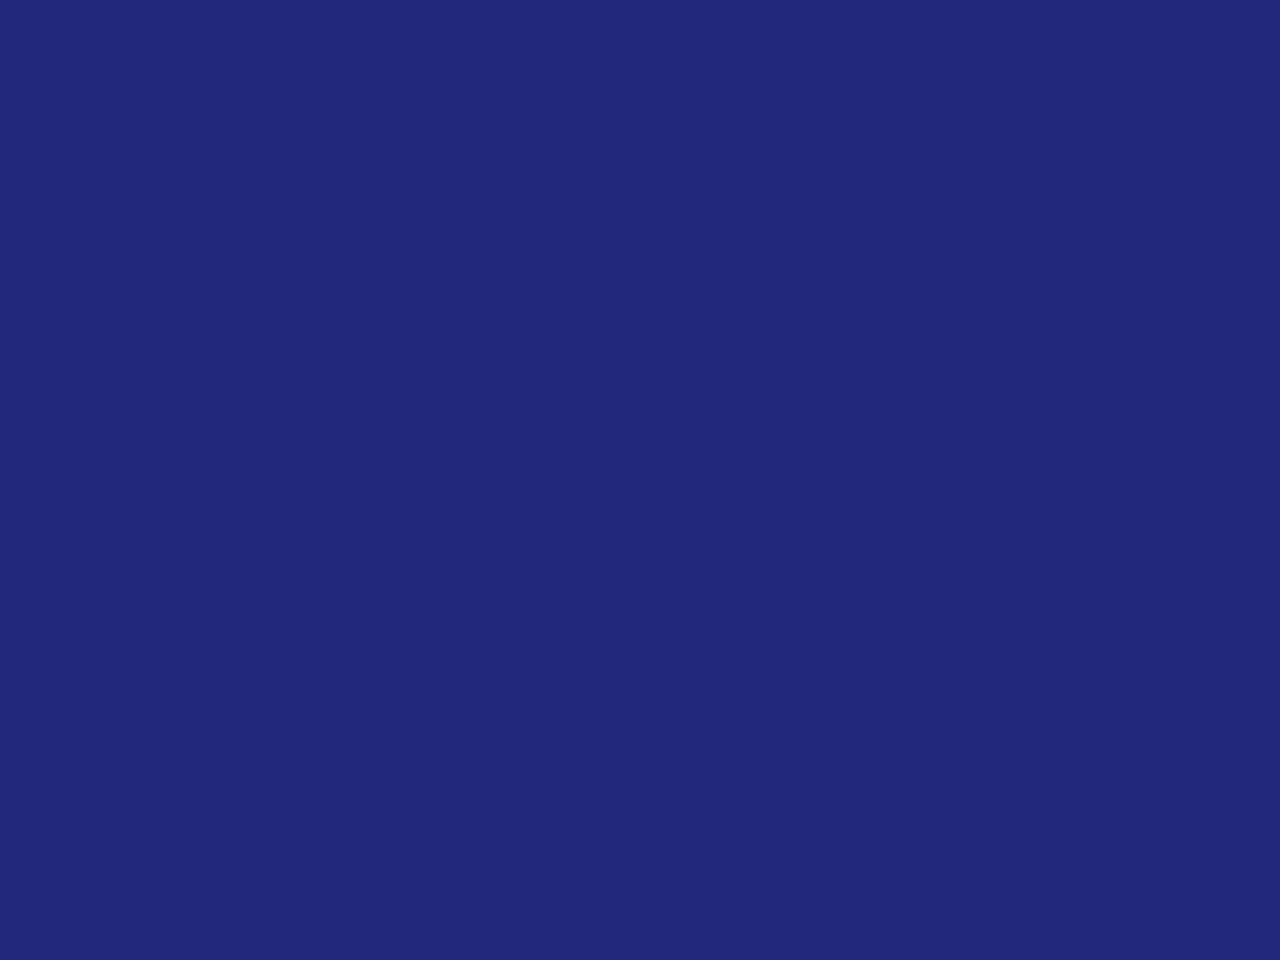 1280x960 St Patricks Blue Solid Color Background